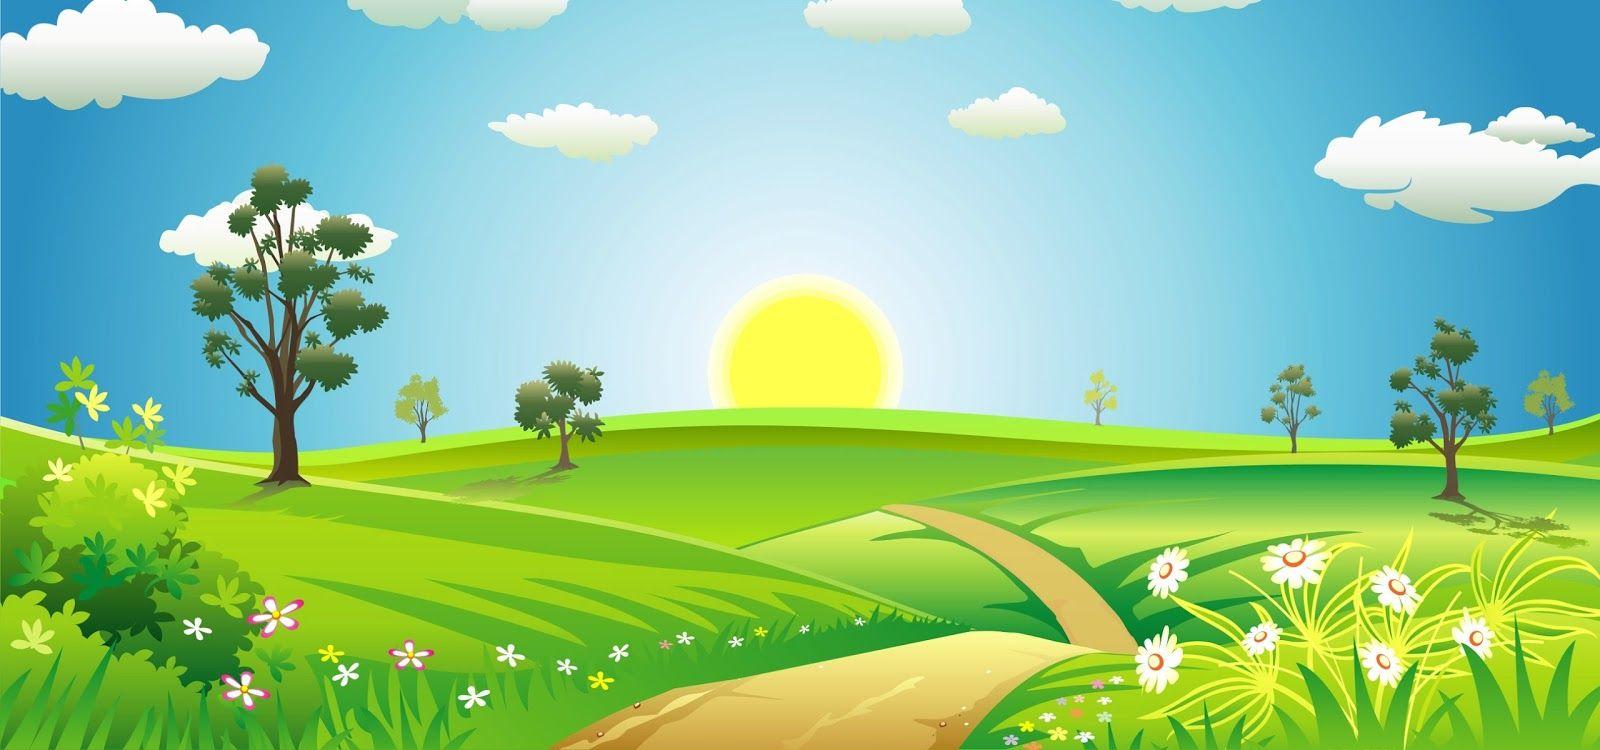 Весенняя лужайка картинка для детей